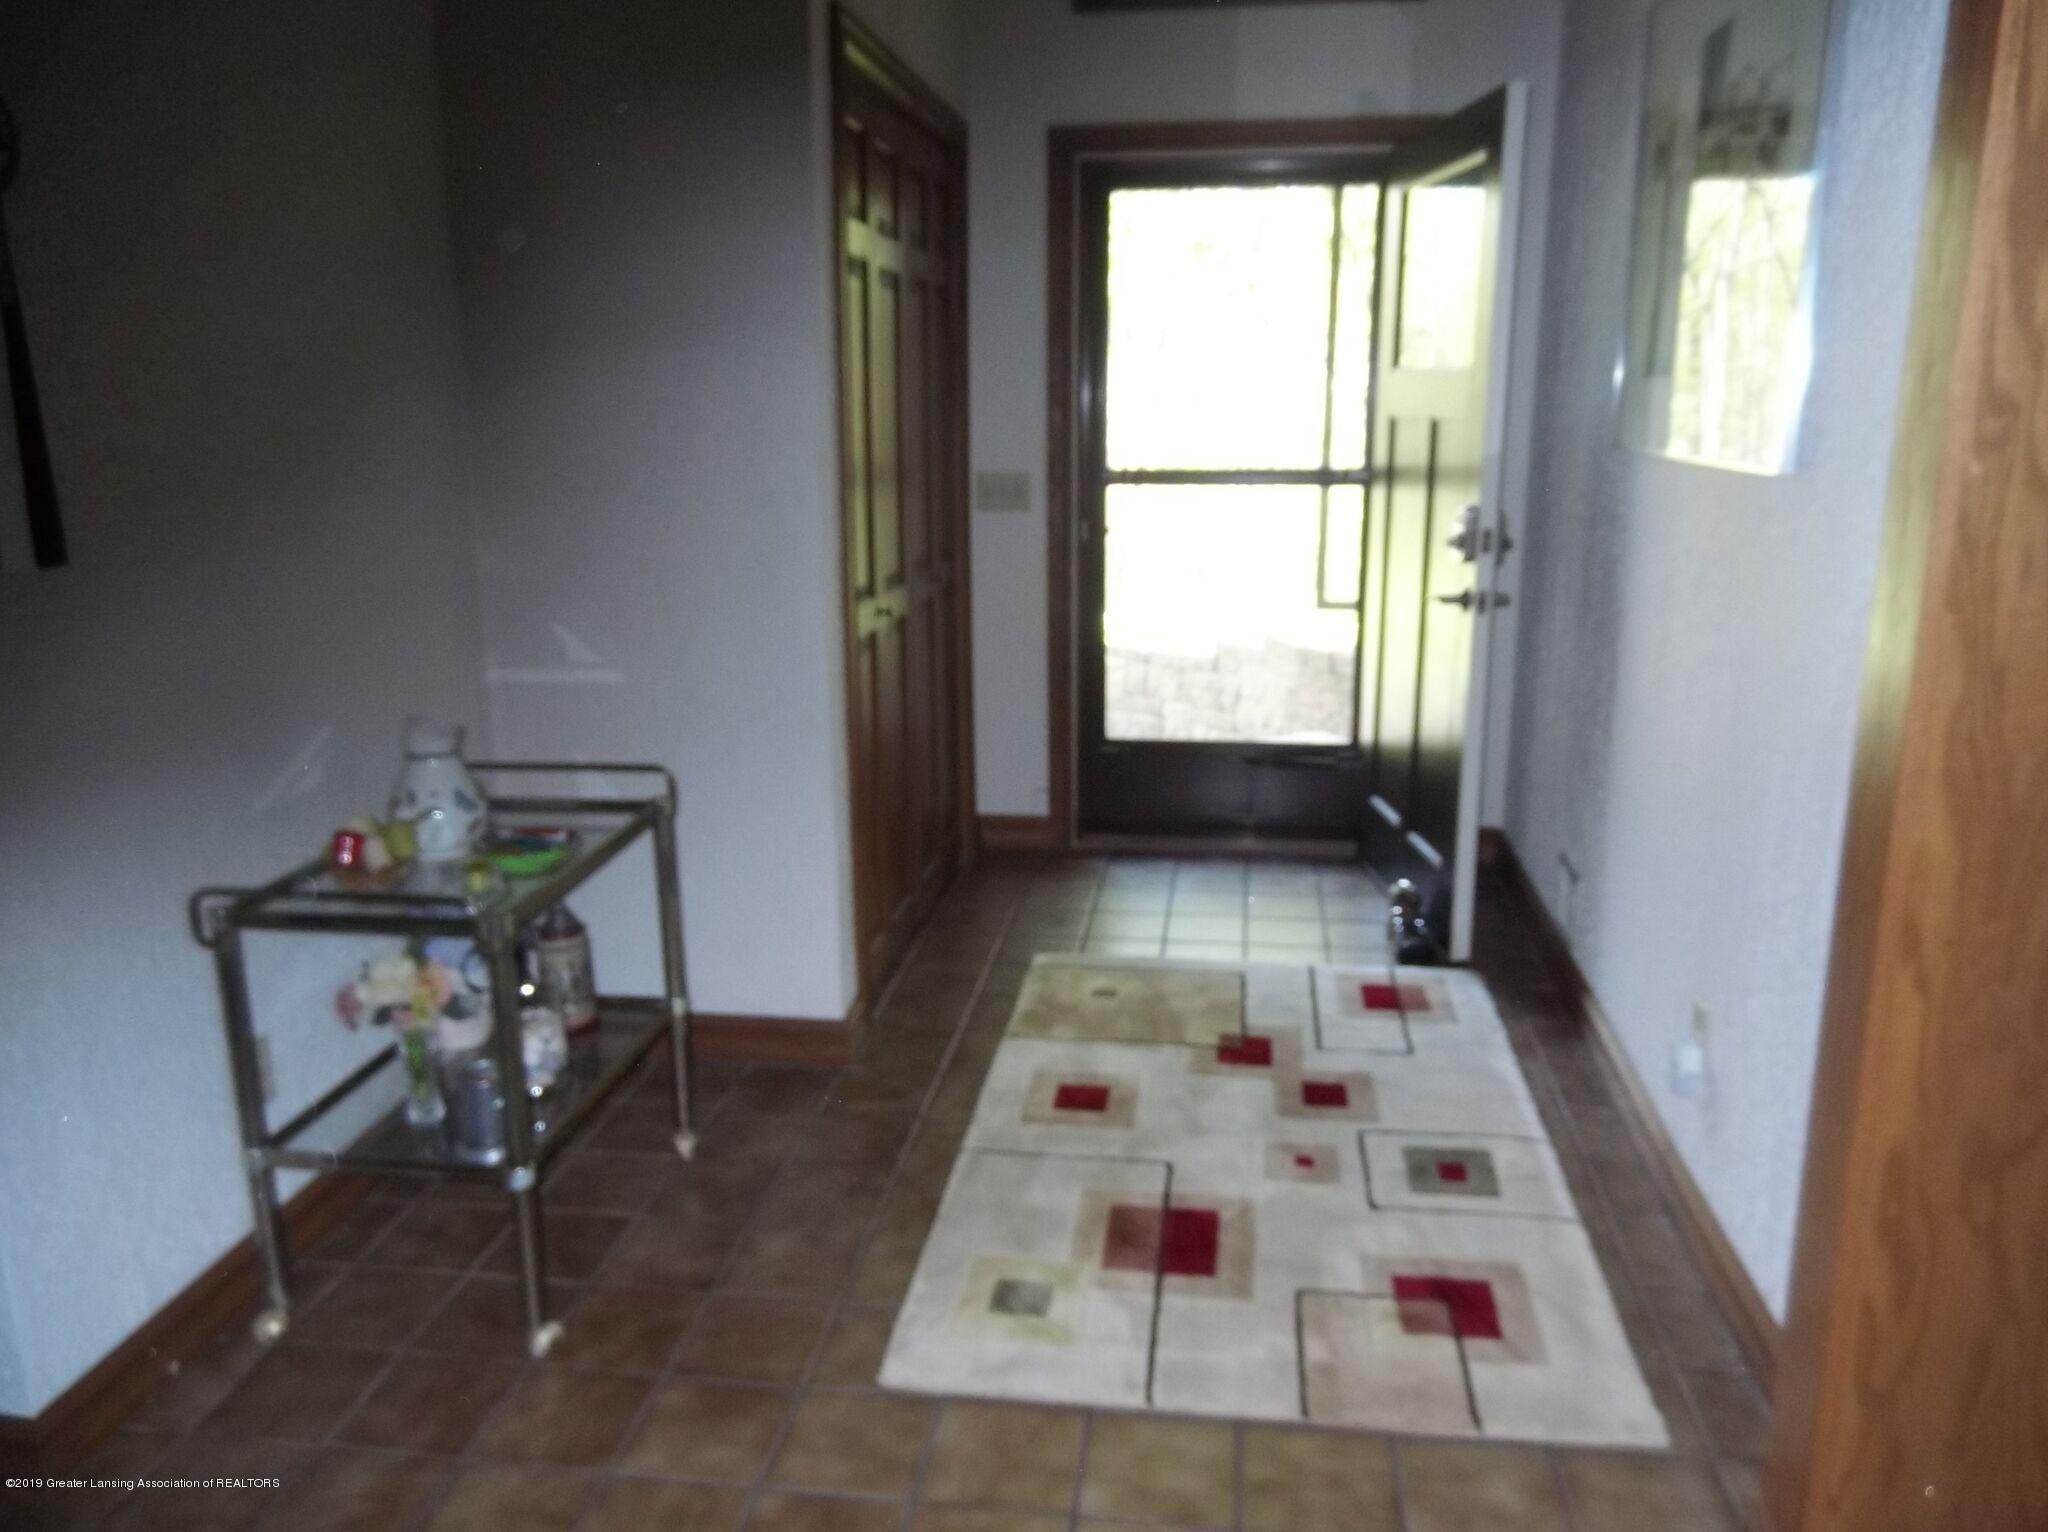 8144 Corrison Rd - Hallway - 3